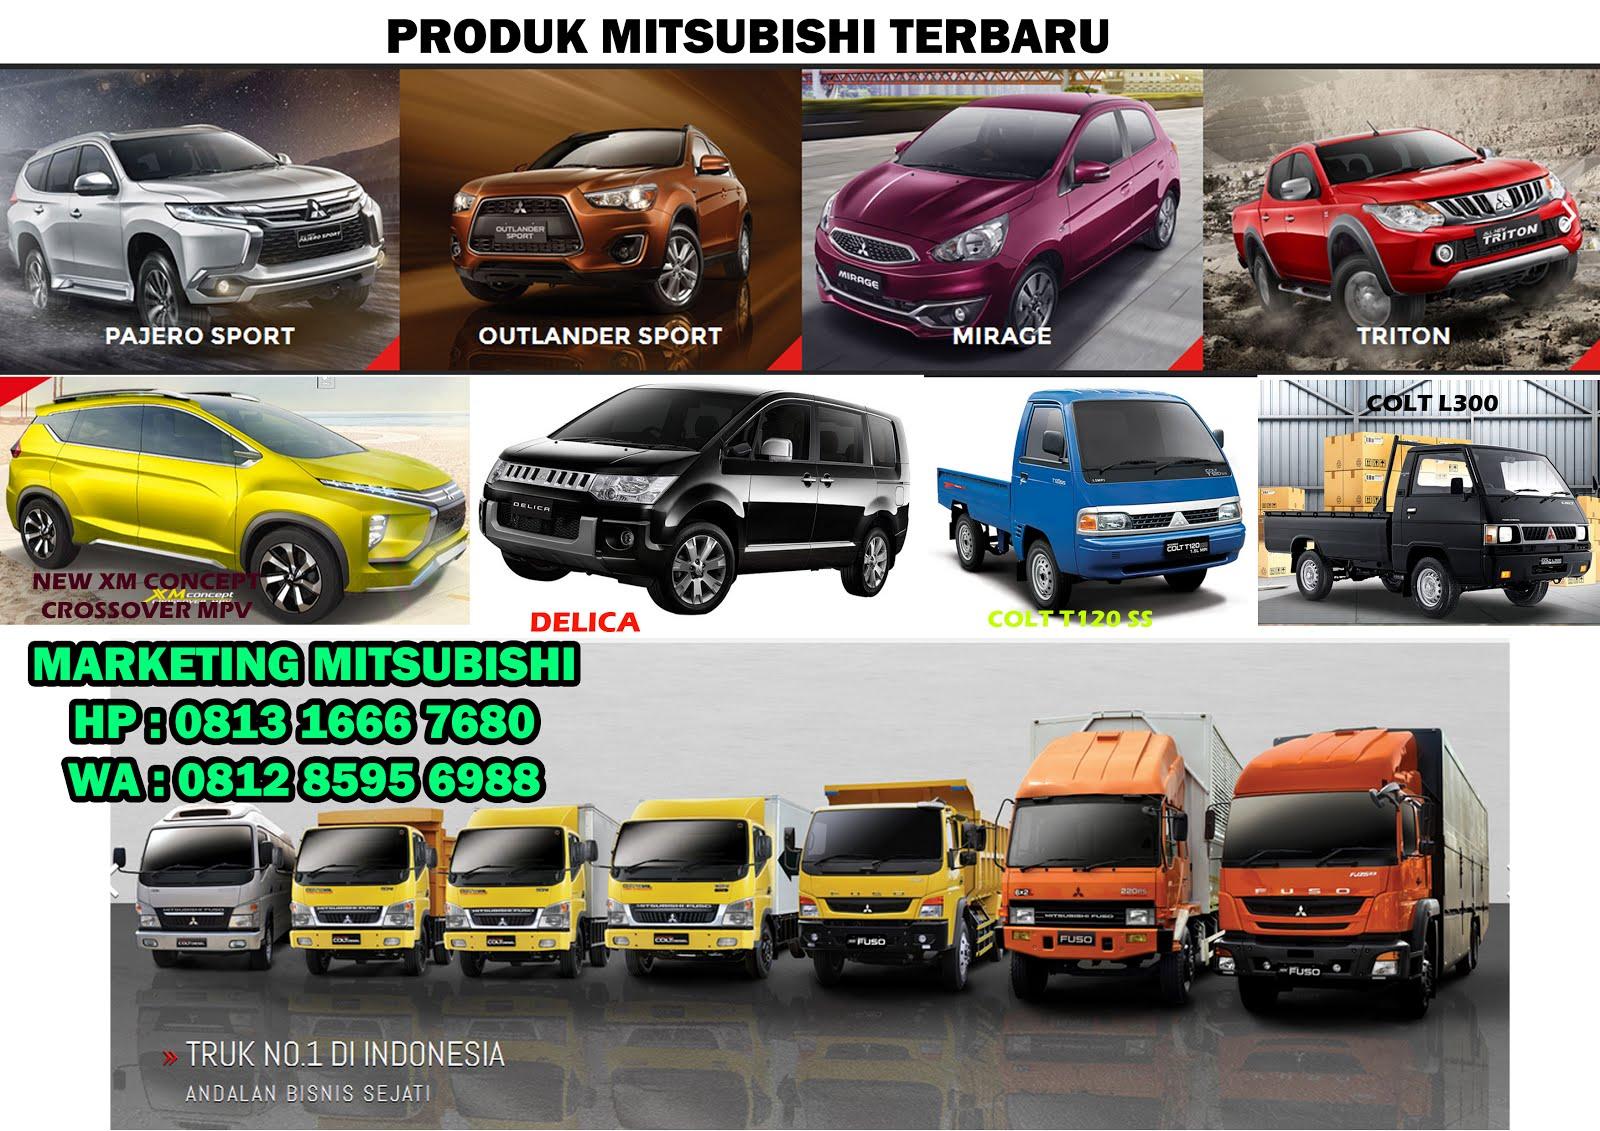 thumb manual fuso mitsubishi details tipper uk used sales canter dealer img van medium